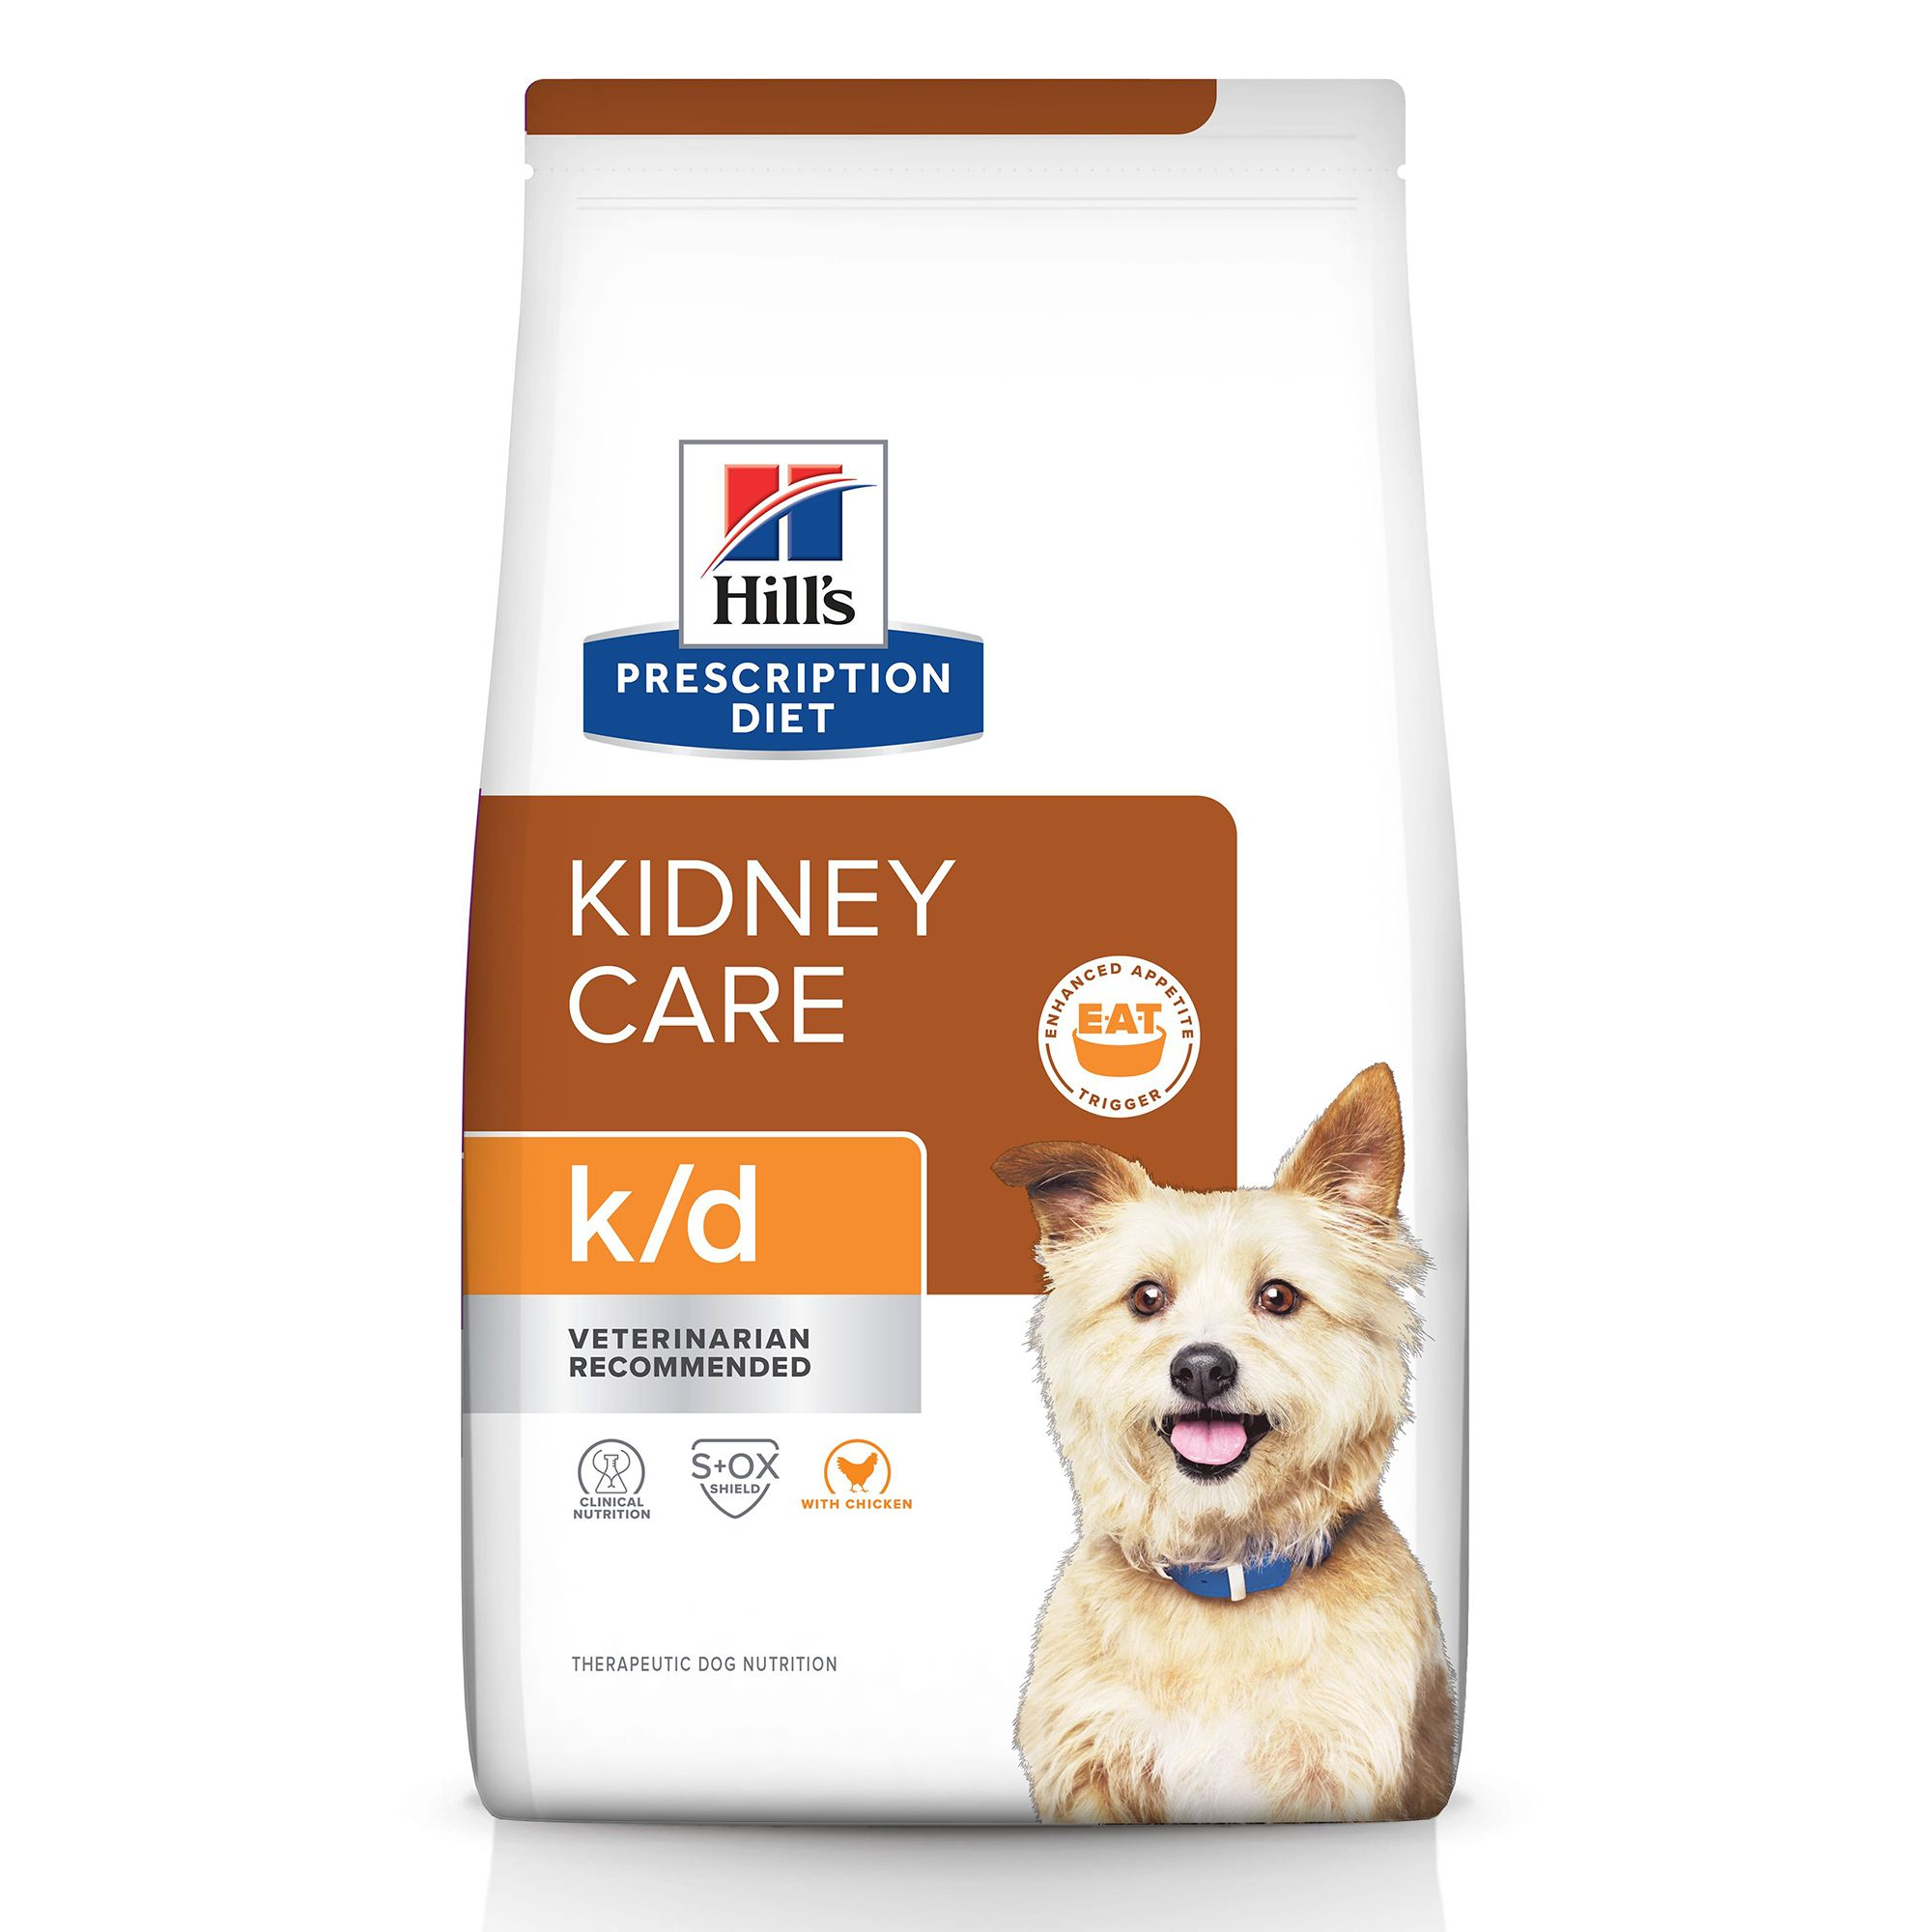 Petsmart Animals Pet Supplies Pro Plan Sensitive Skin And Coat Puppy 25kg Hills Prescription Diet K D Kidney Care Dog Food Chicken